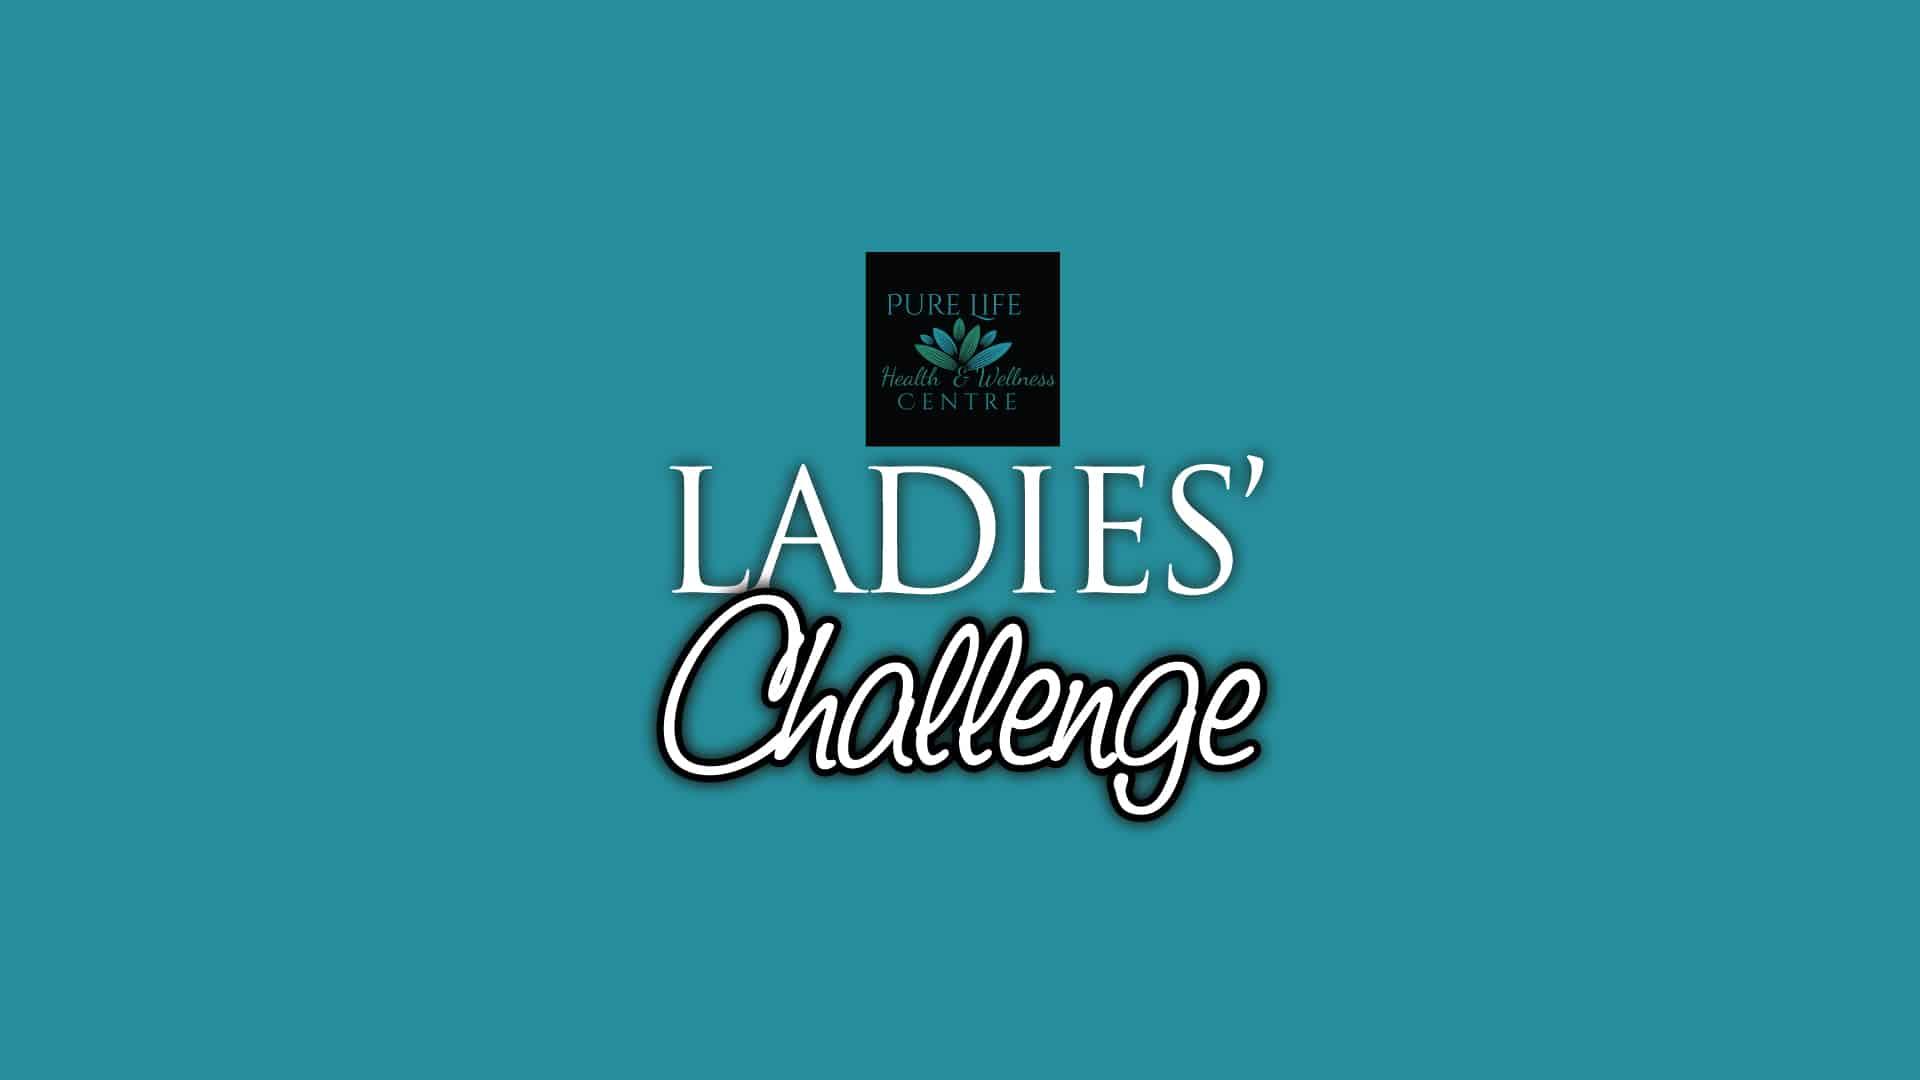 Pure Life Health & Wellness Centre Ladies Challenge